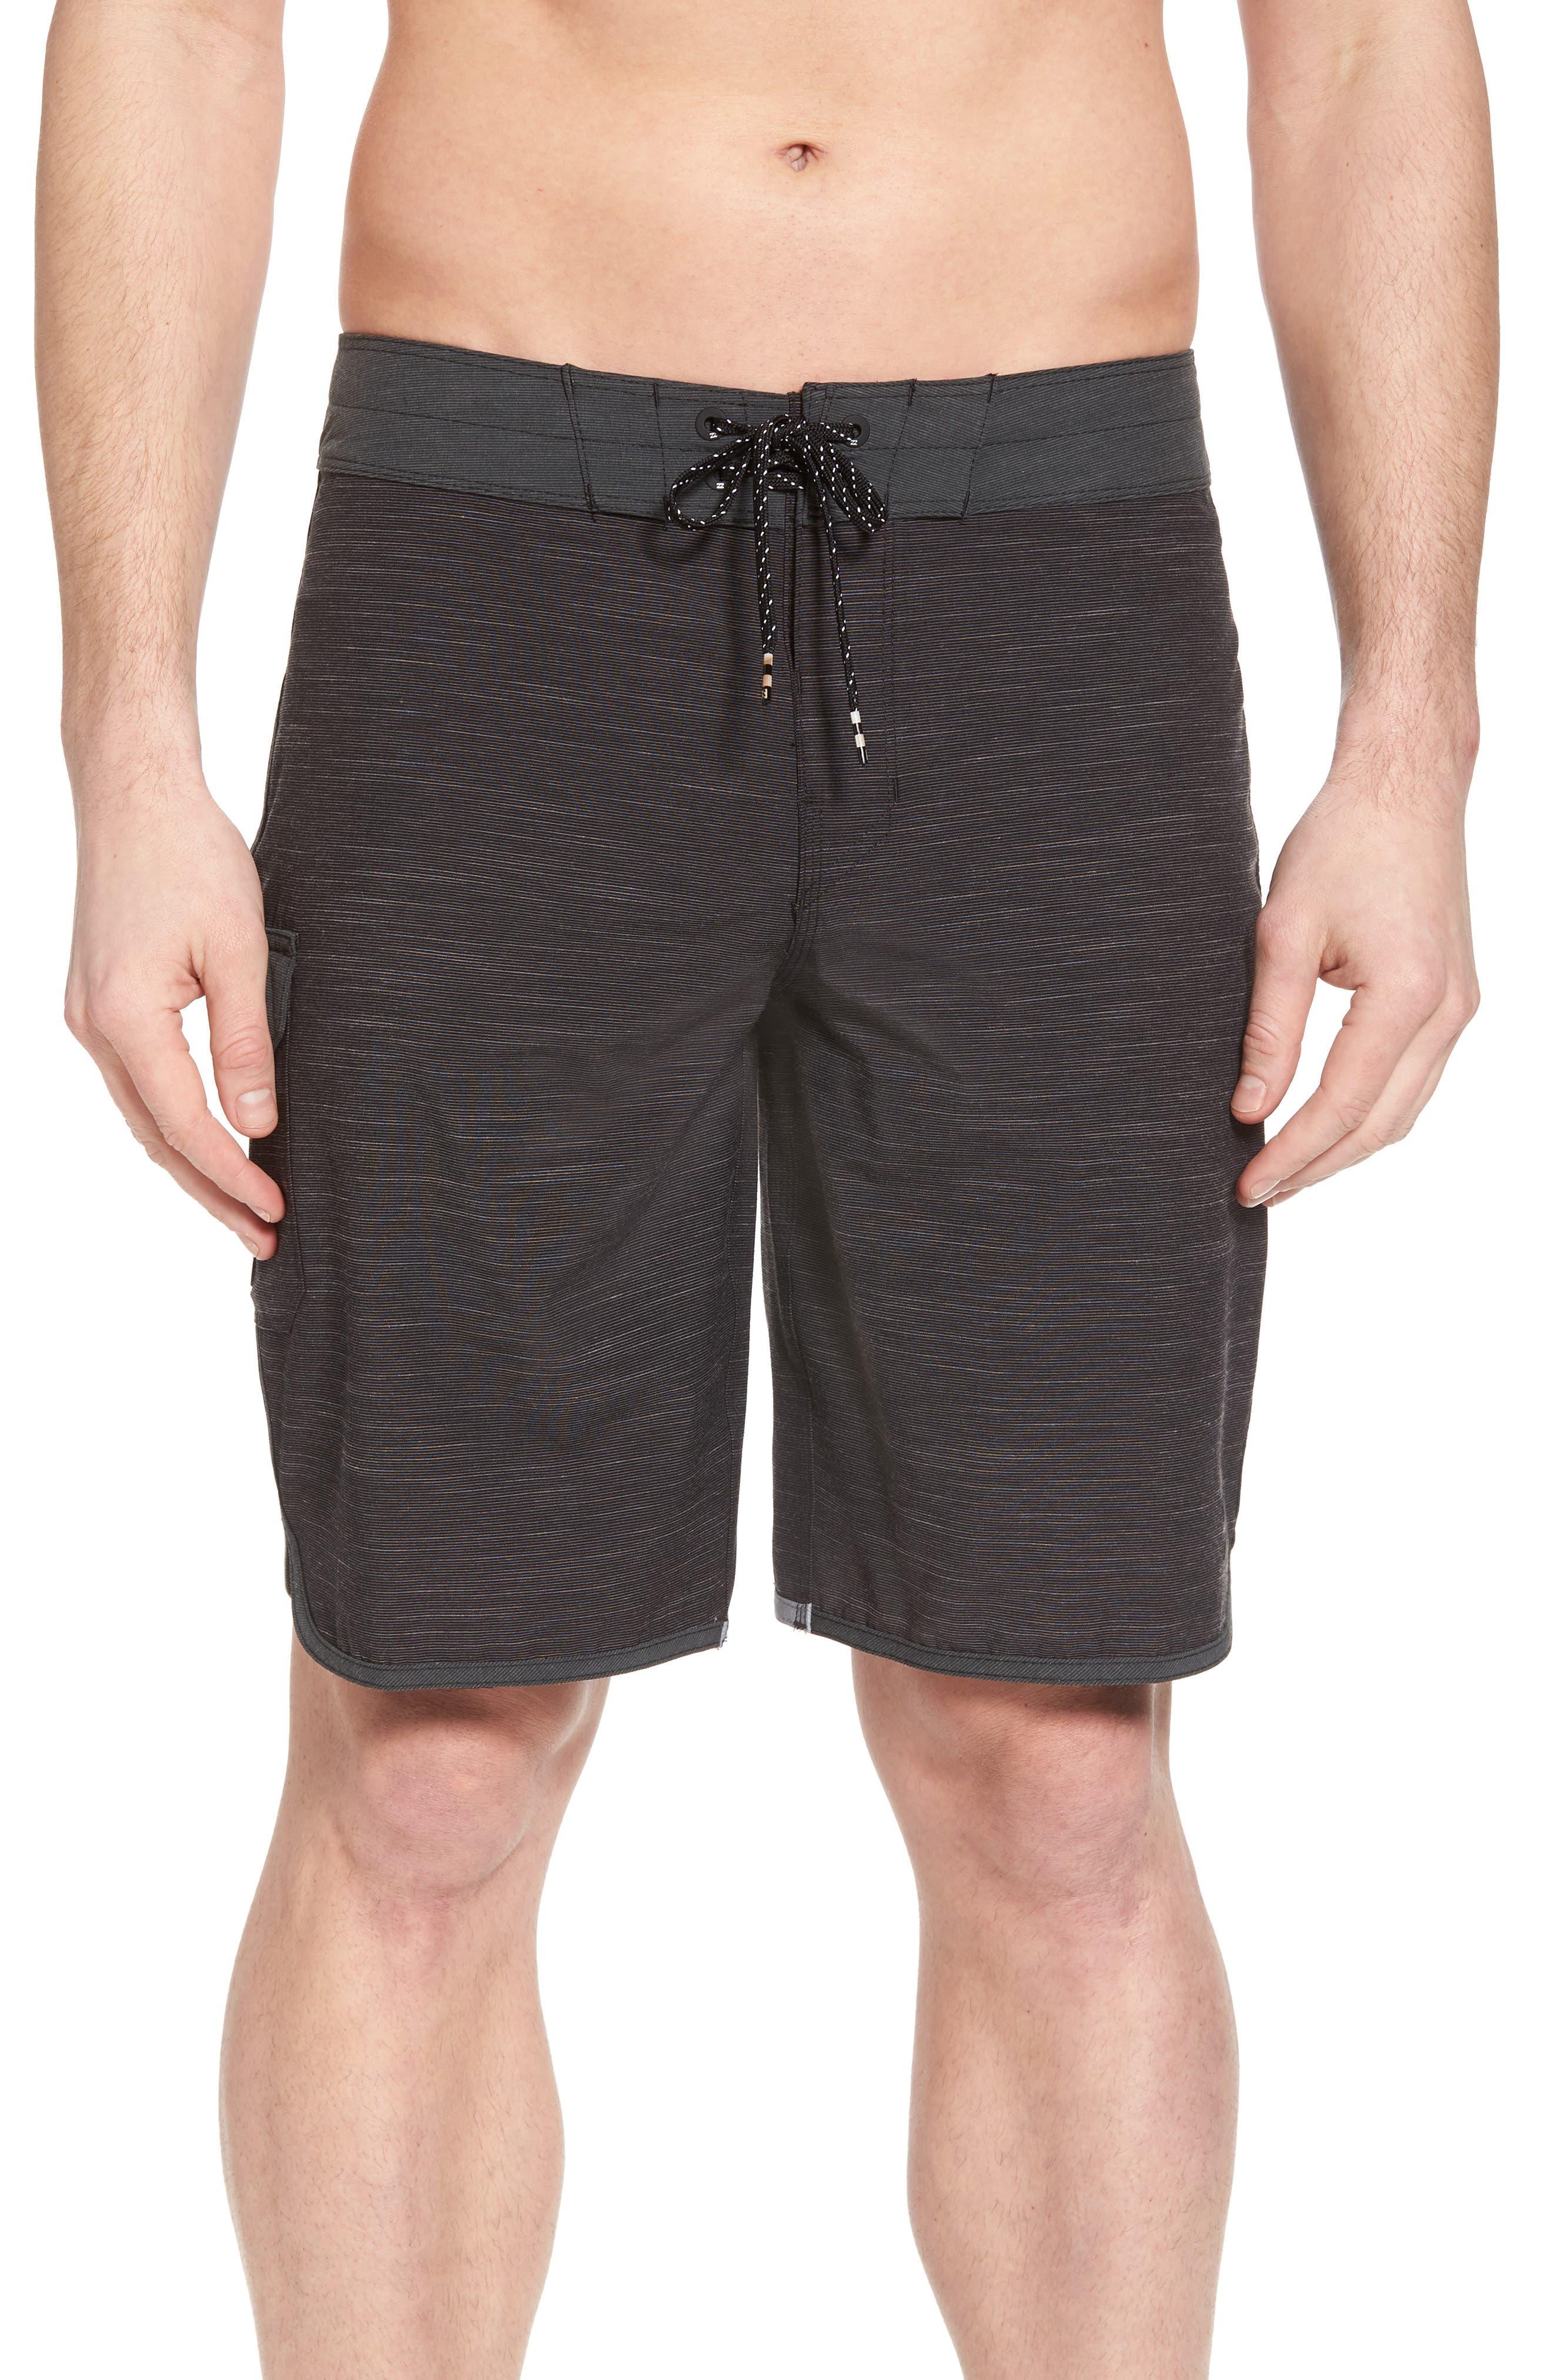 73 X Short Board Shorts,                         Main,                         color, 001